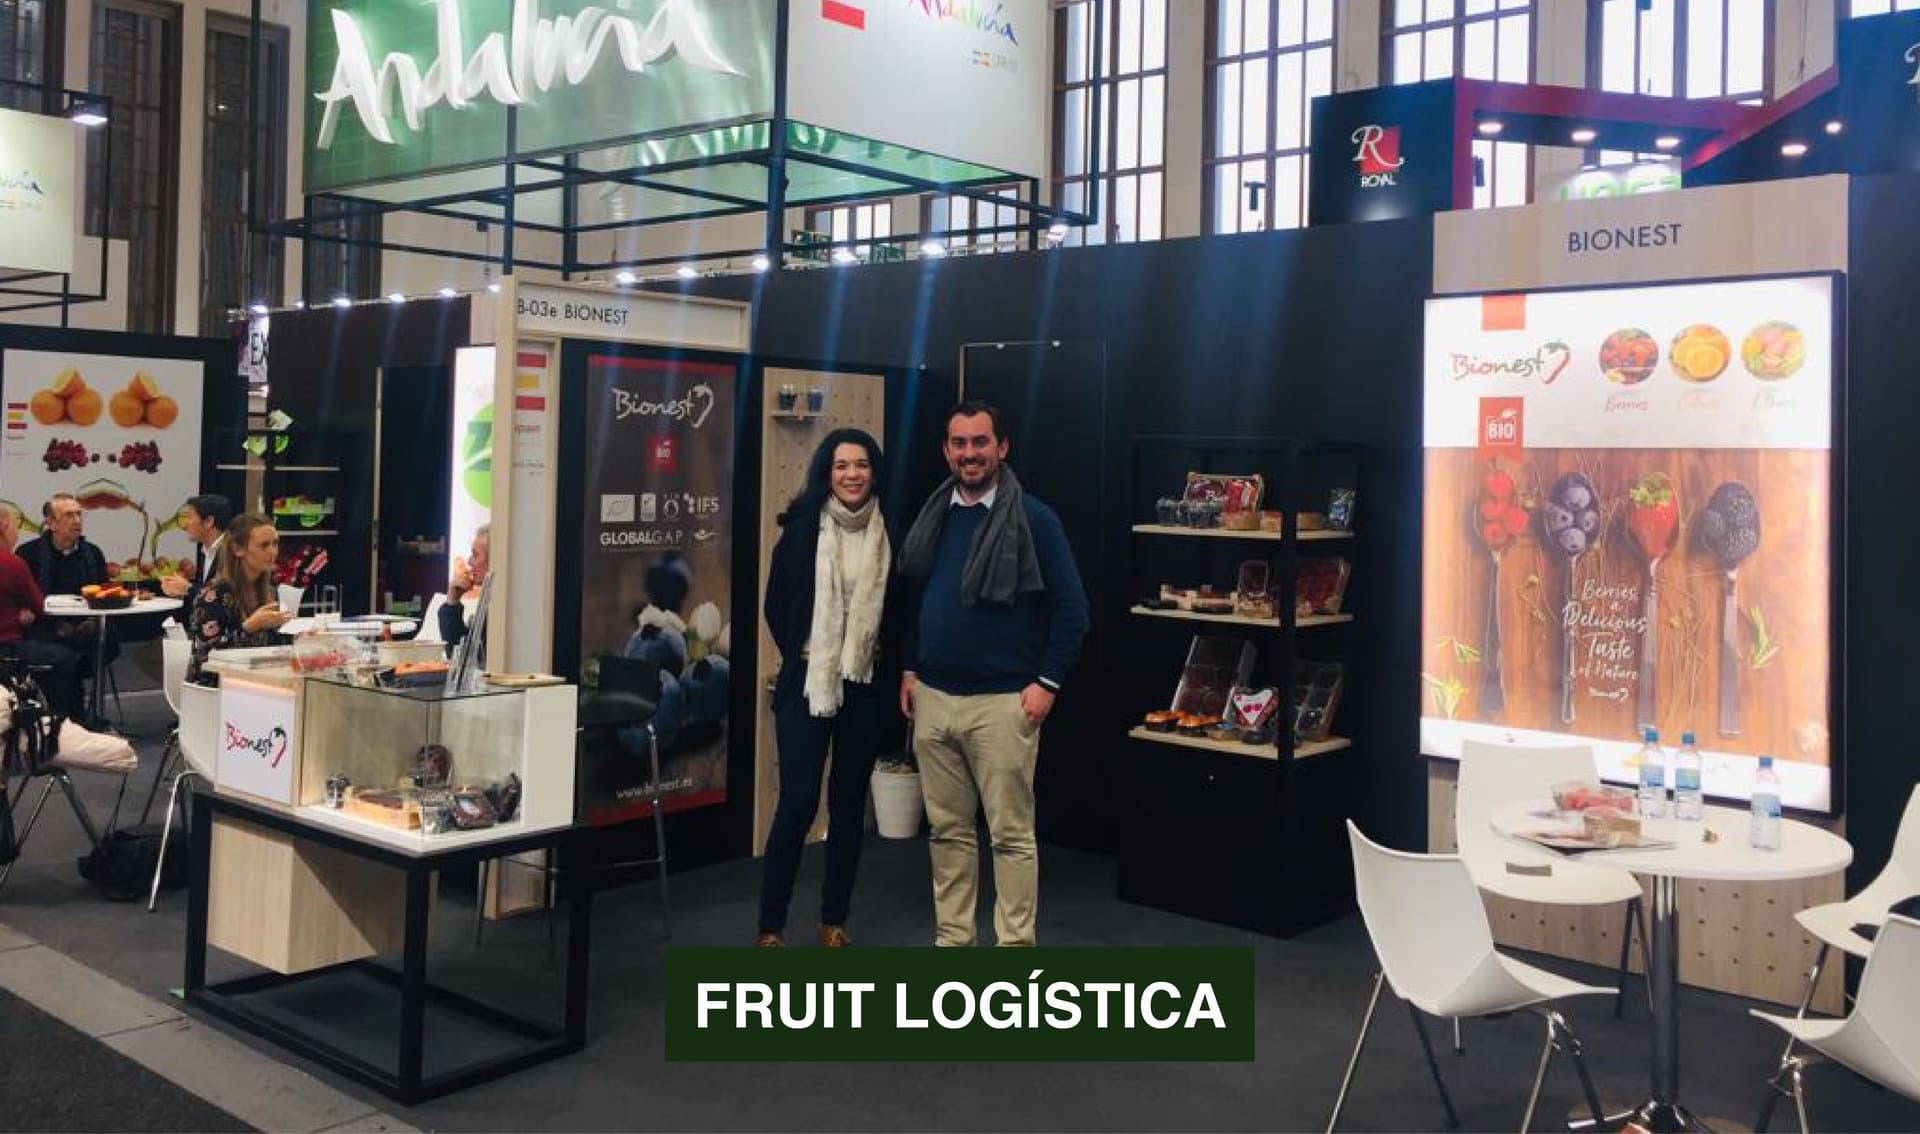 fruit-logistica-bionest